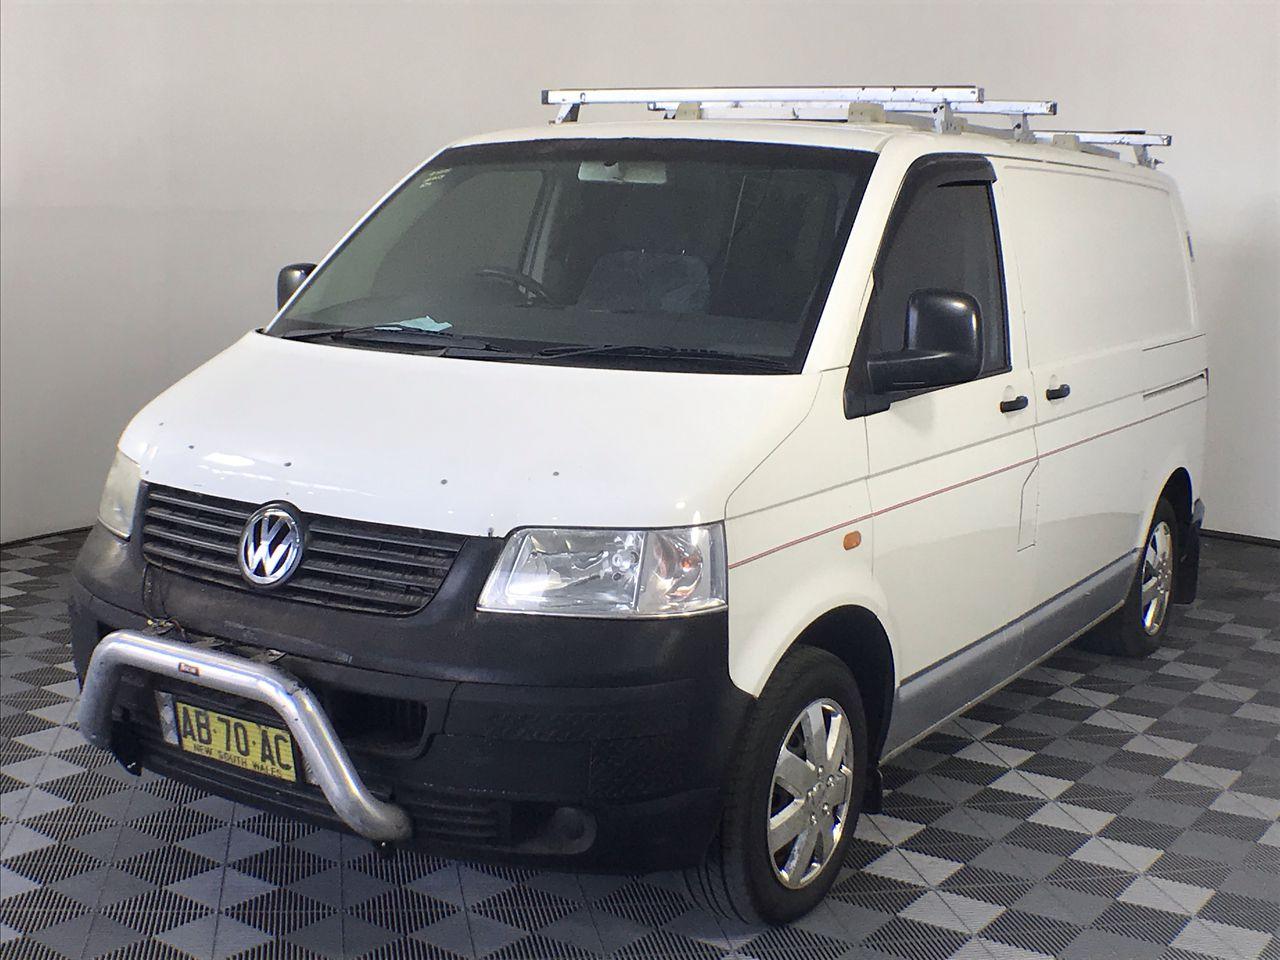 2005 Volkswagen Transporter (SWB) T5 Turbo Diesel Manual Campervan